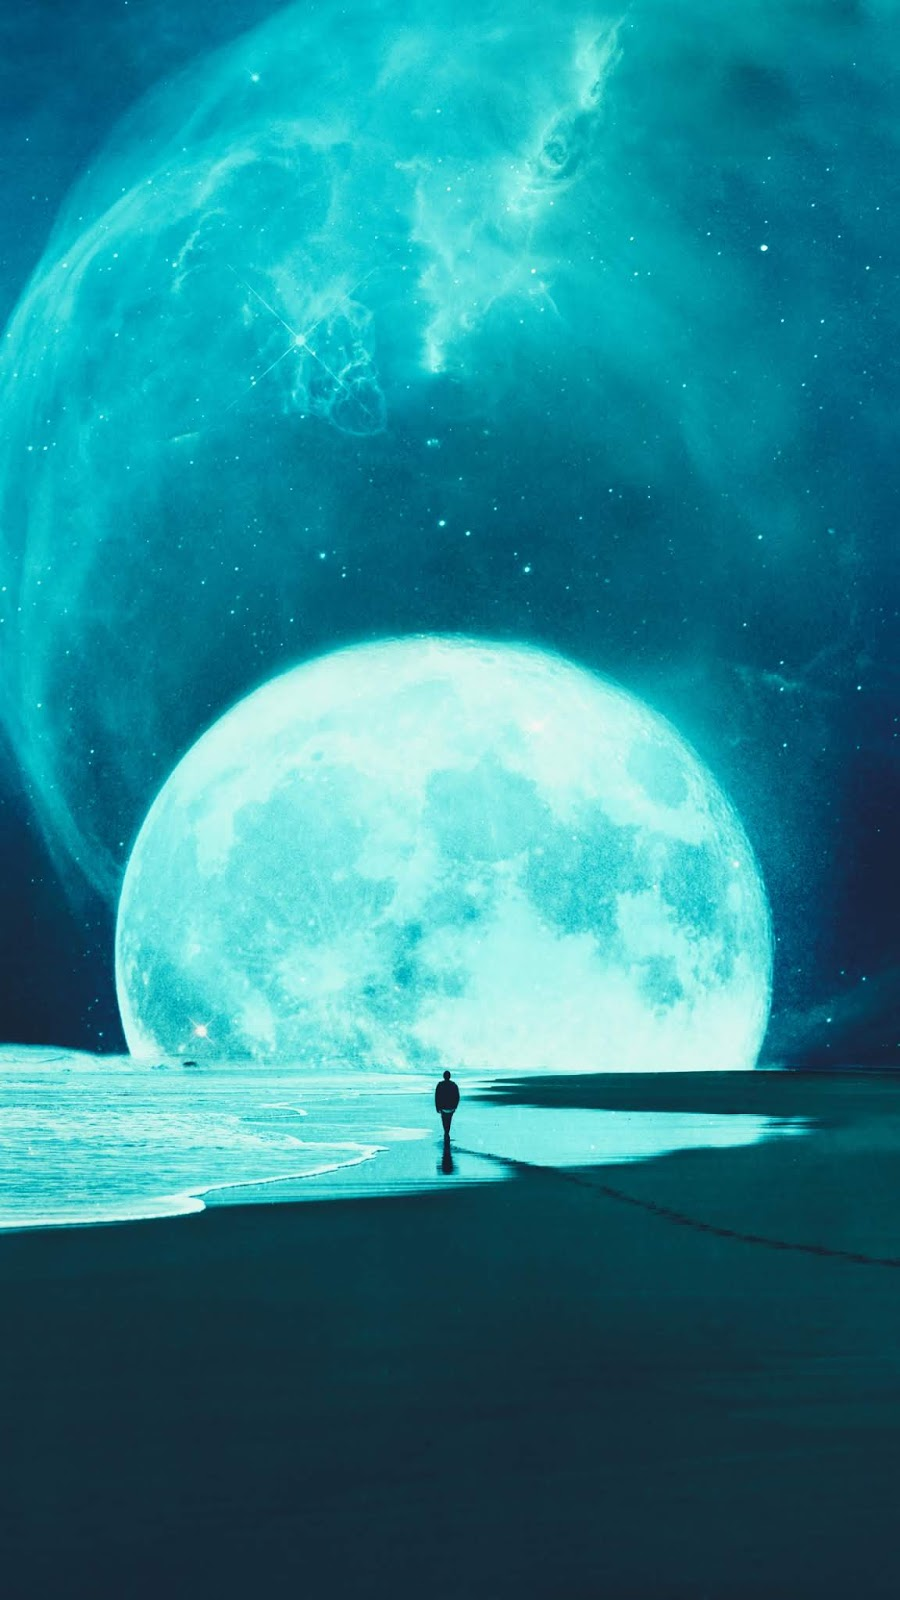 Night beach under full moon